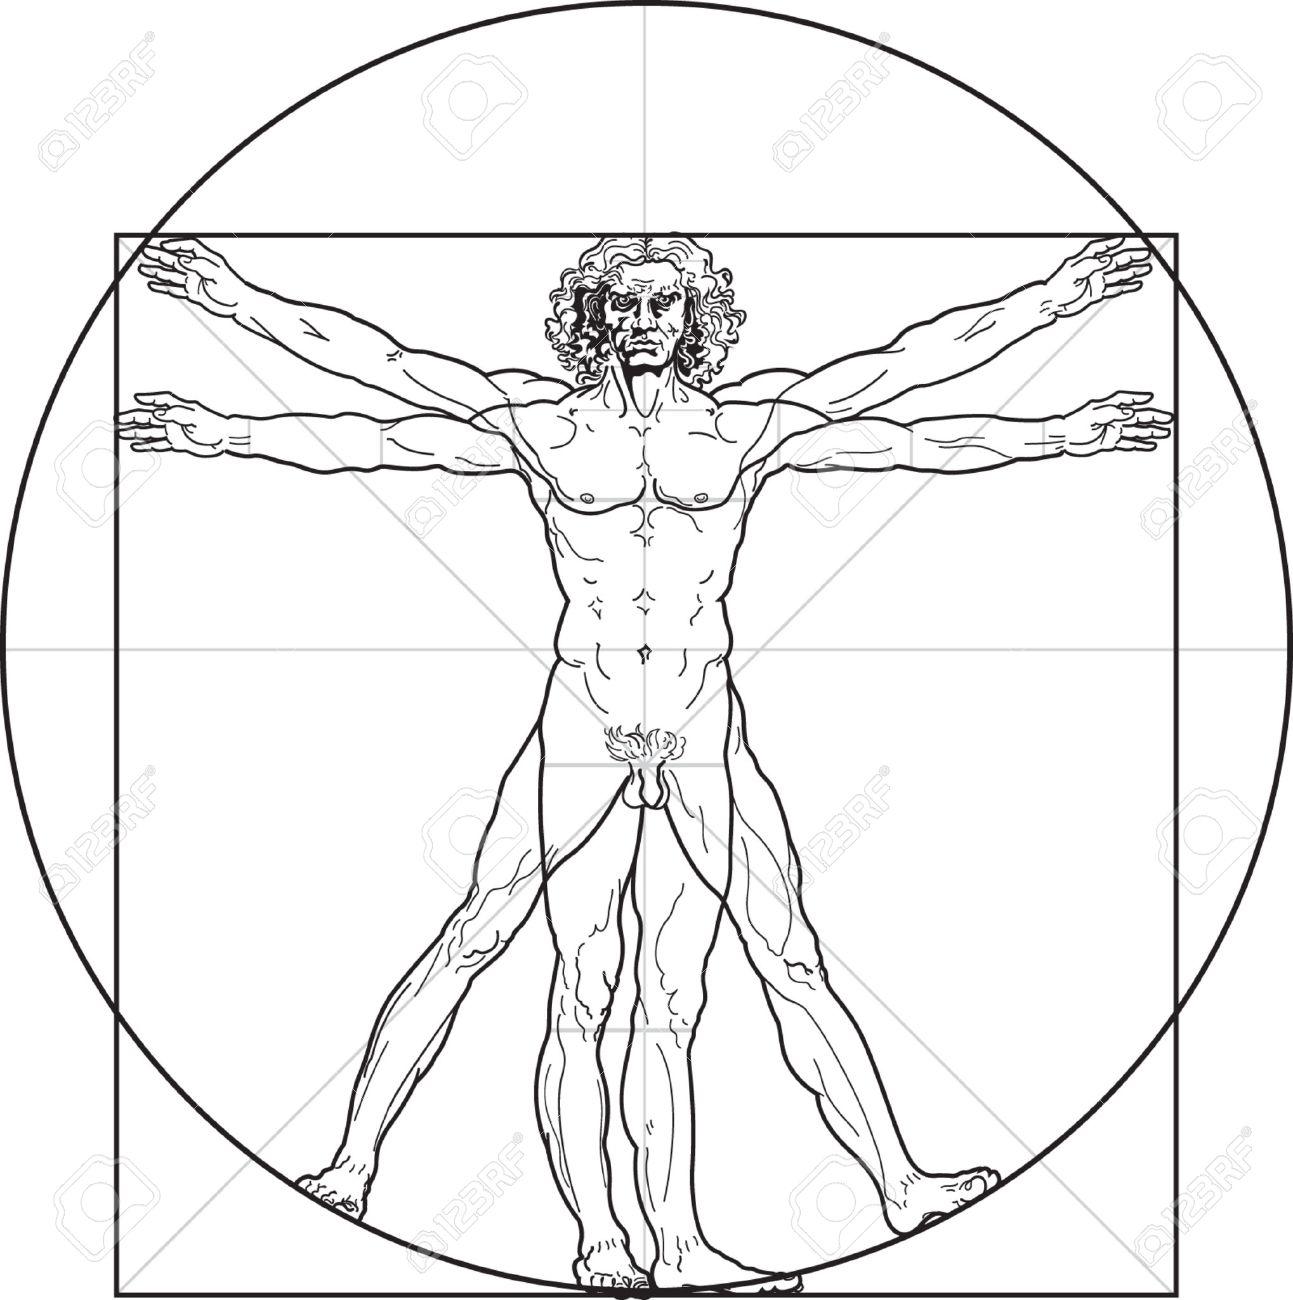 The Vitruvian man, or so called Leonardo's man. Detailed drawing on the basis of artwork by Leonardo da Vinci (executed circa in 1490) by ancient manuscript of Roman master Marcus Vitruvius Pollio. Stock Vector - 5681604